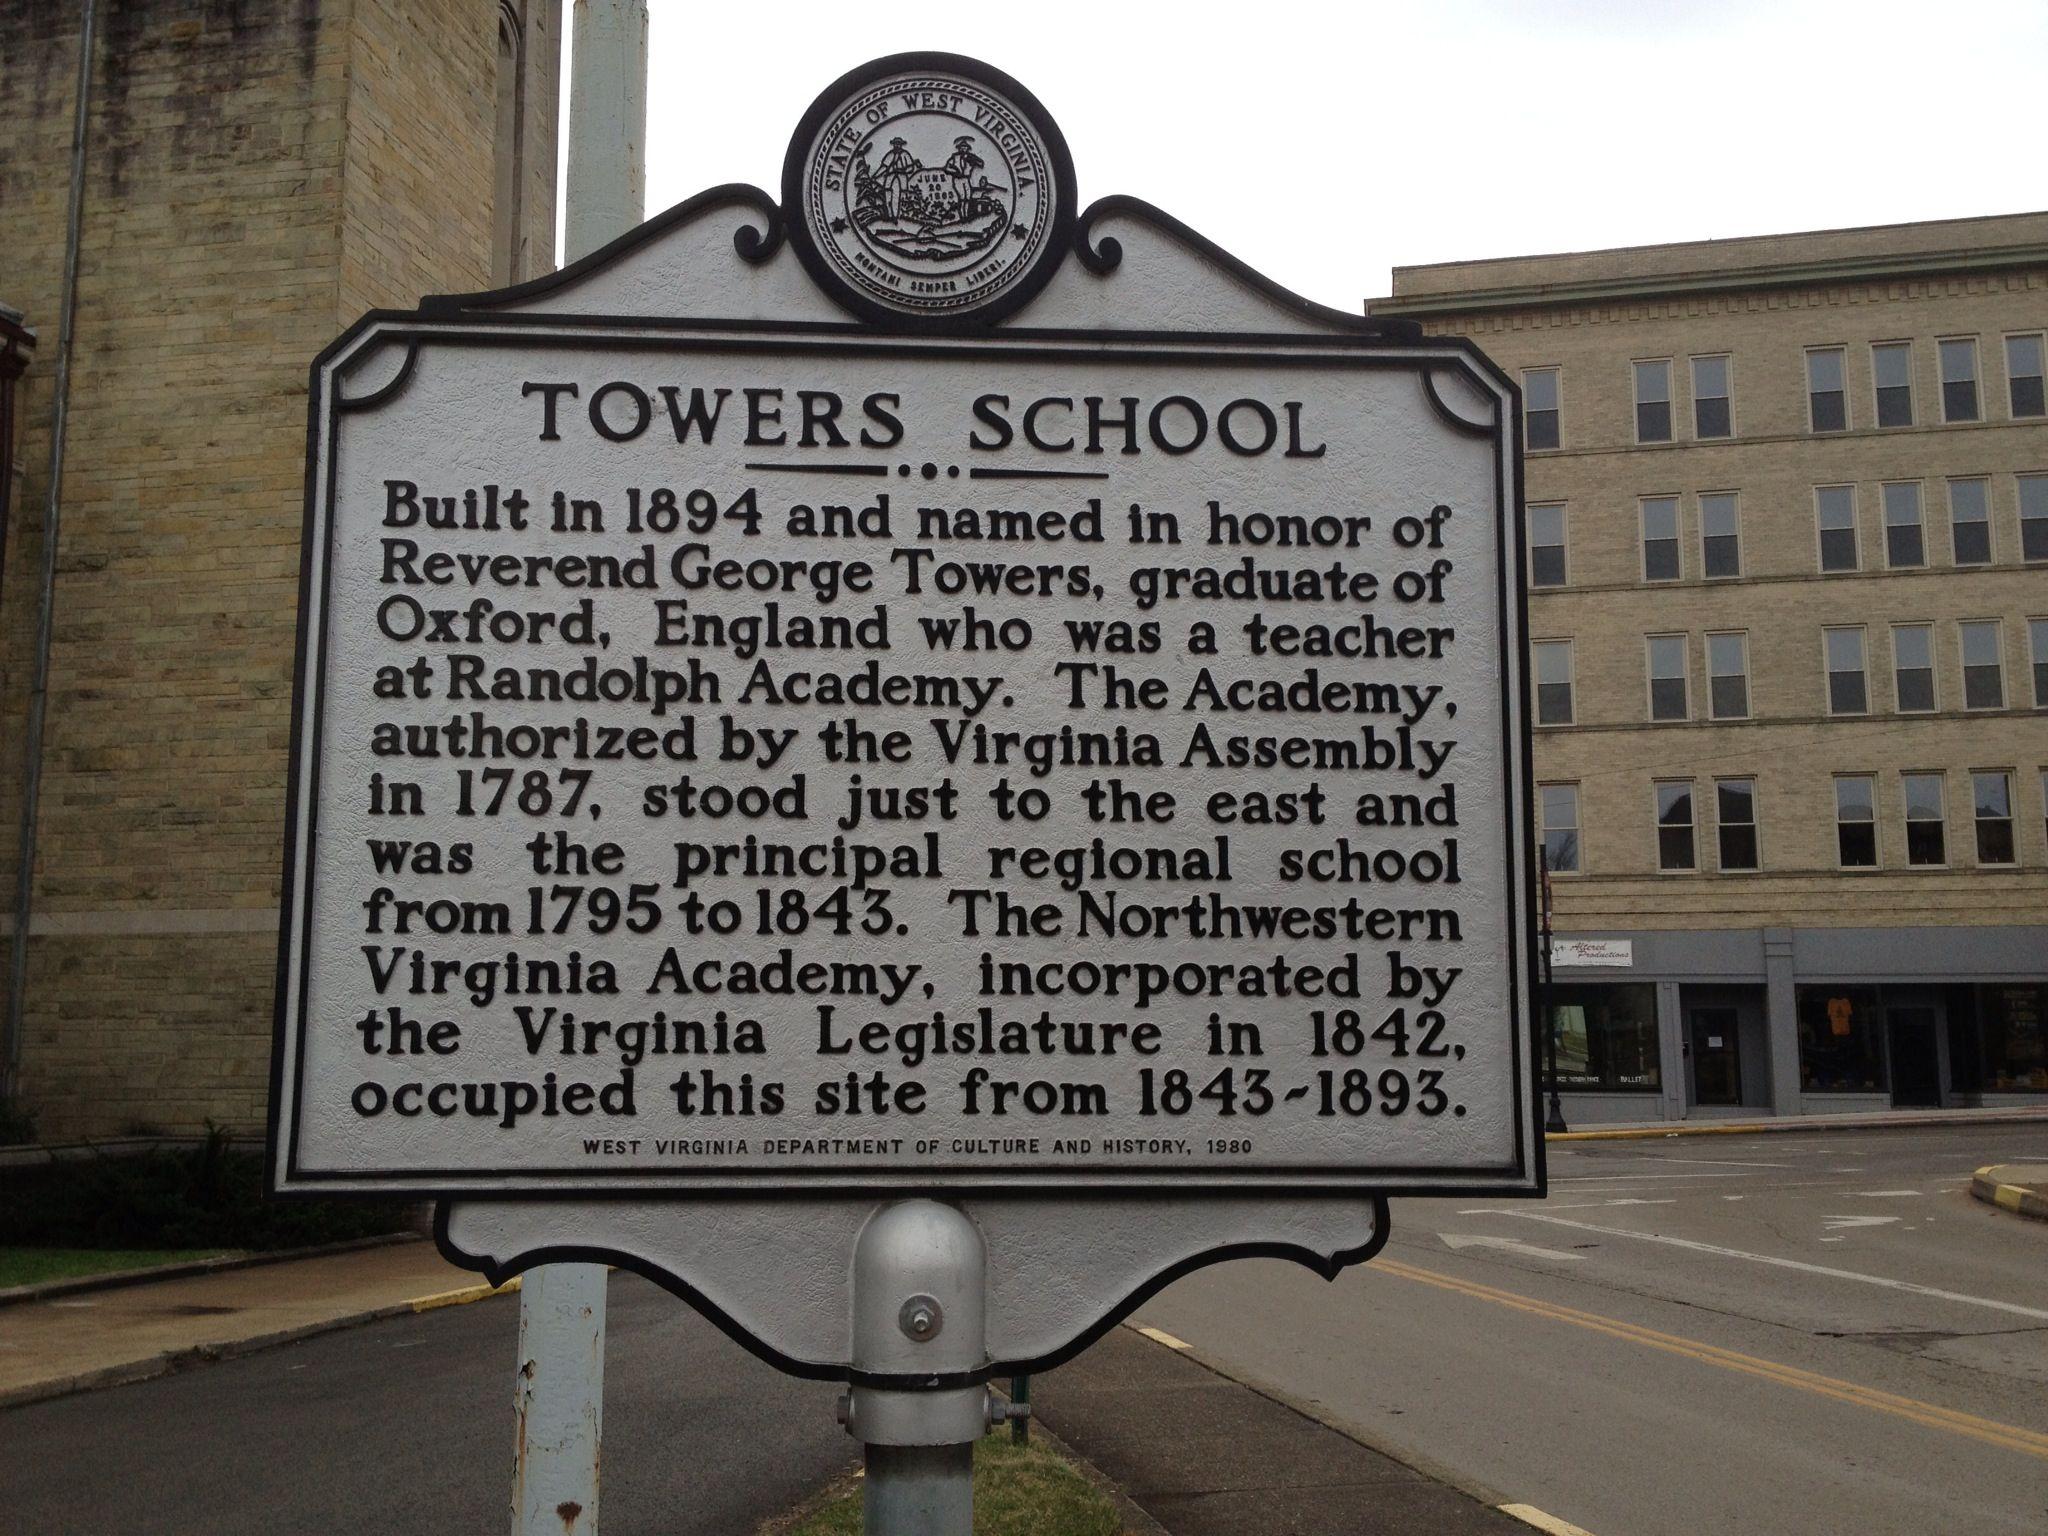 Towers School Clarksburg Wv My Mom Went To School Here West Virginia History West Virginia Mountains Clarksburg